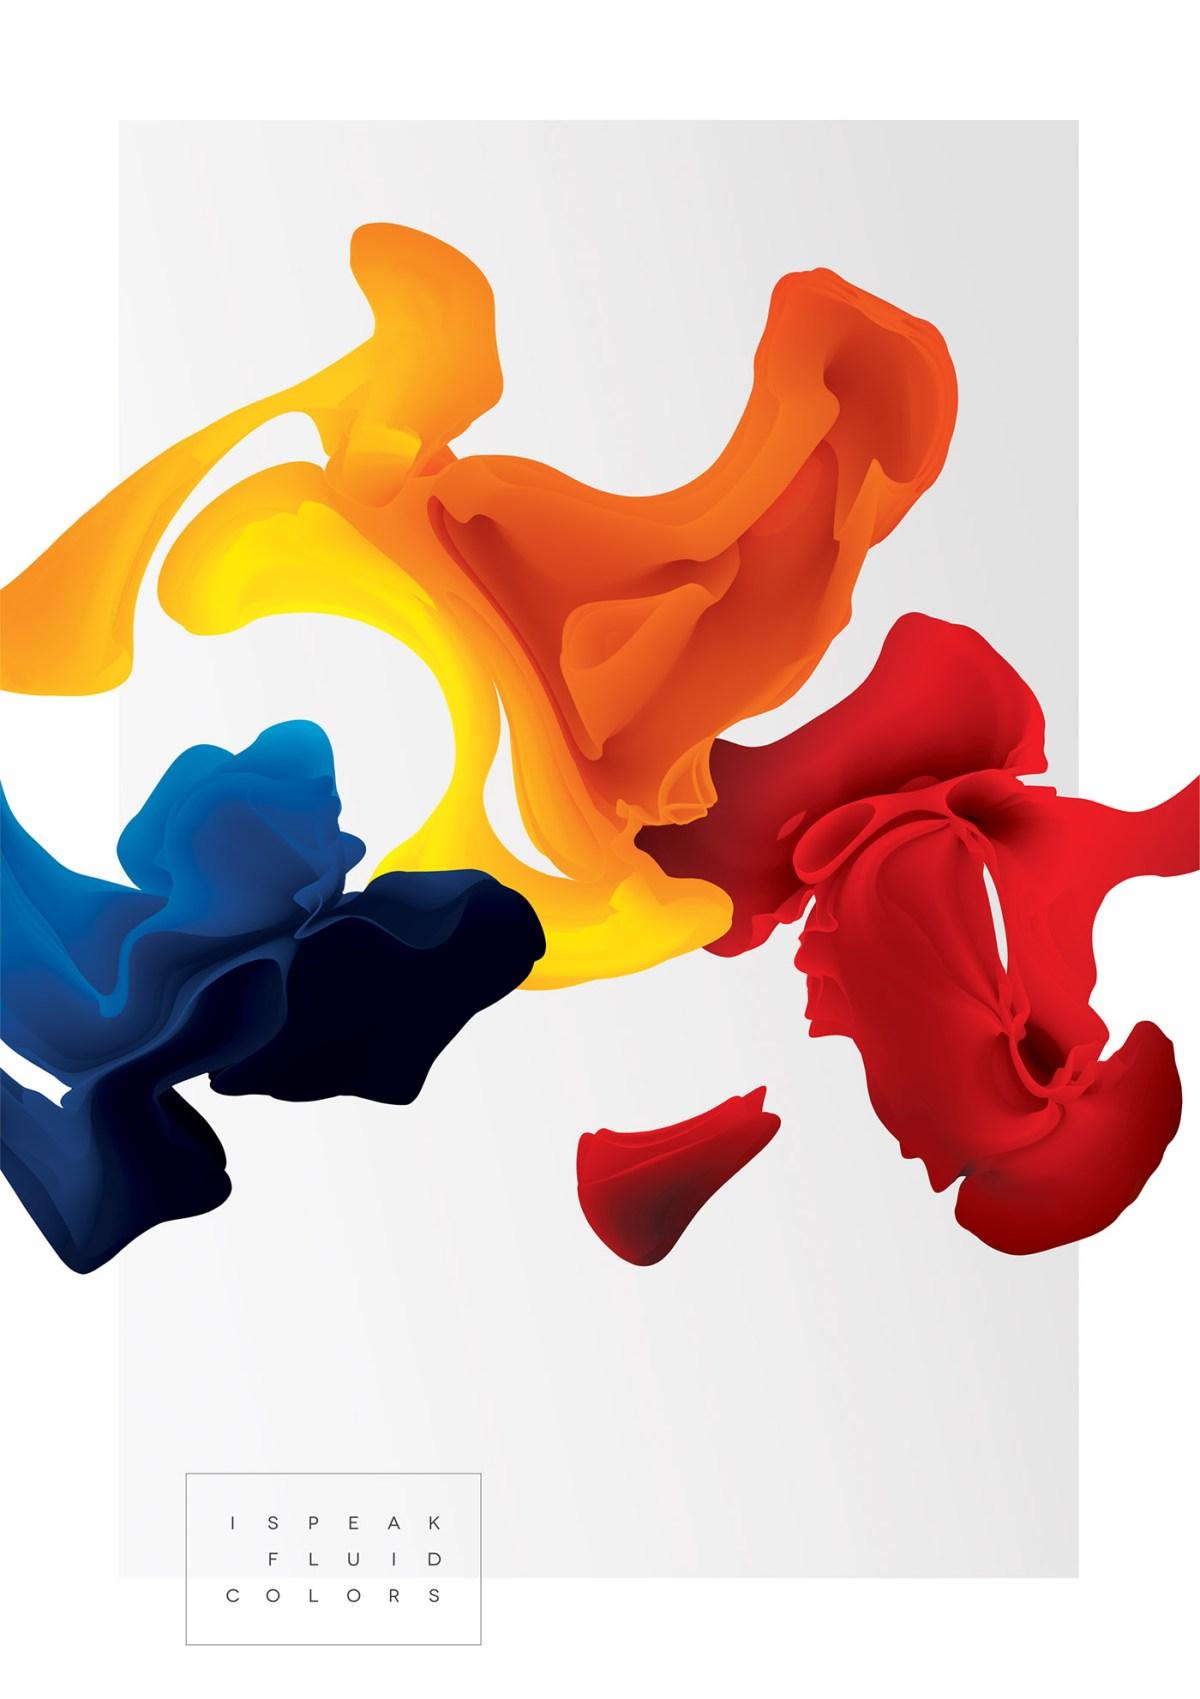 fluid-colors-moss-and-fog-2